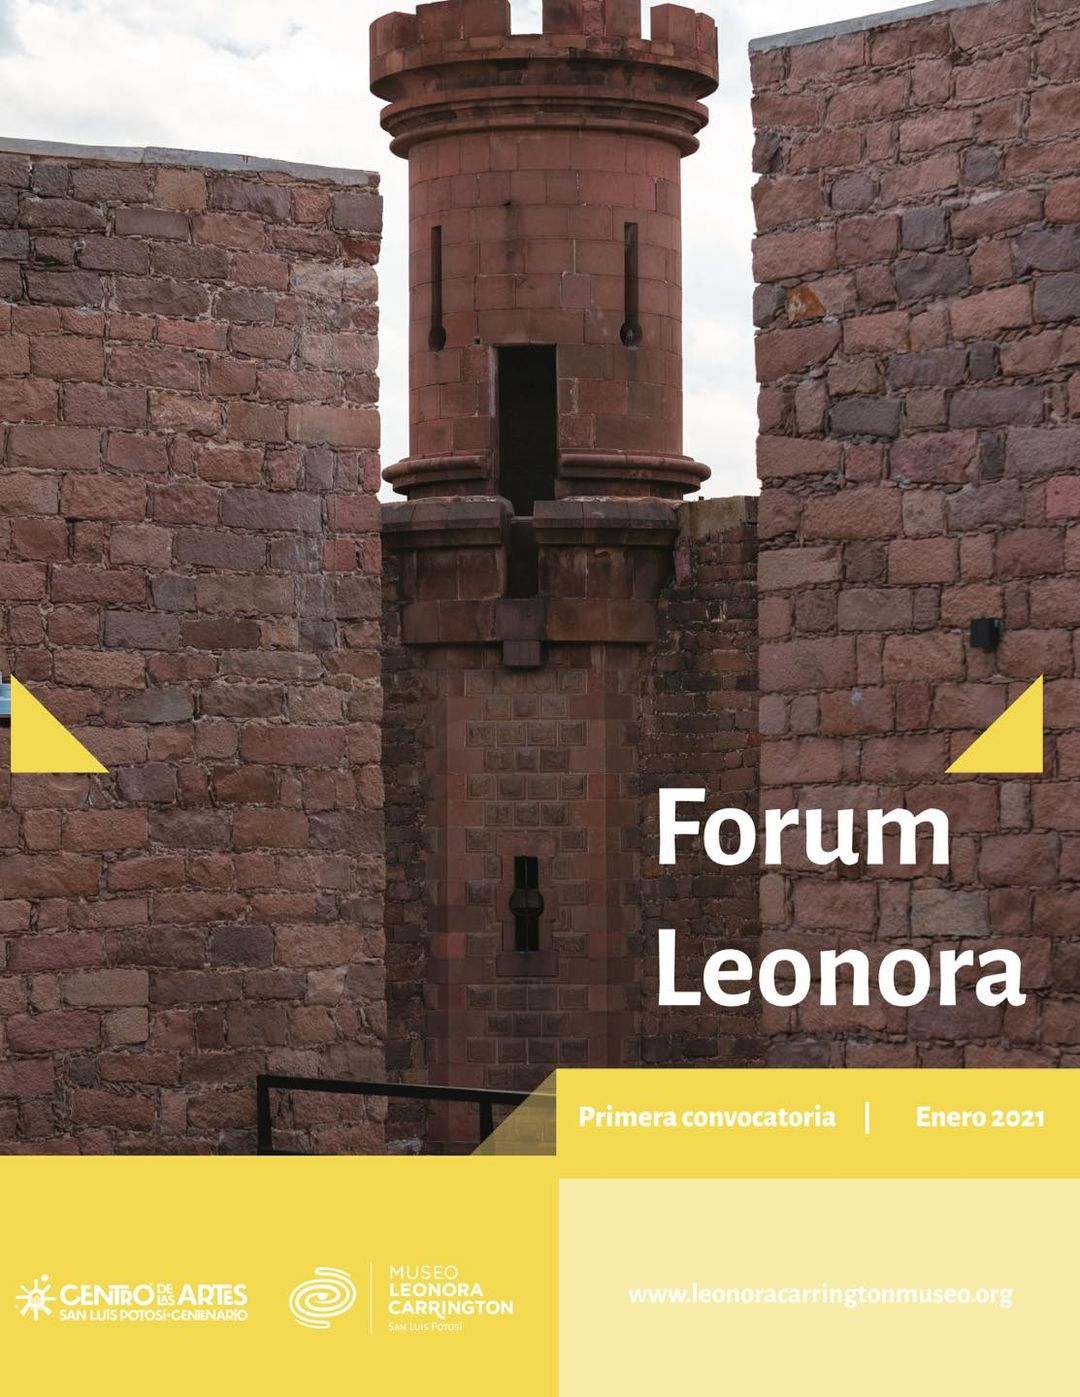 Convocatoria abierta Forum Leonora